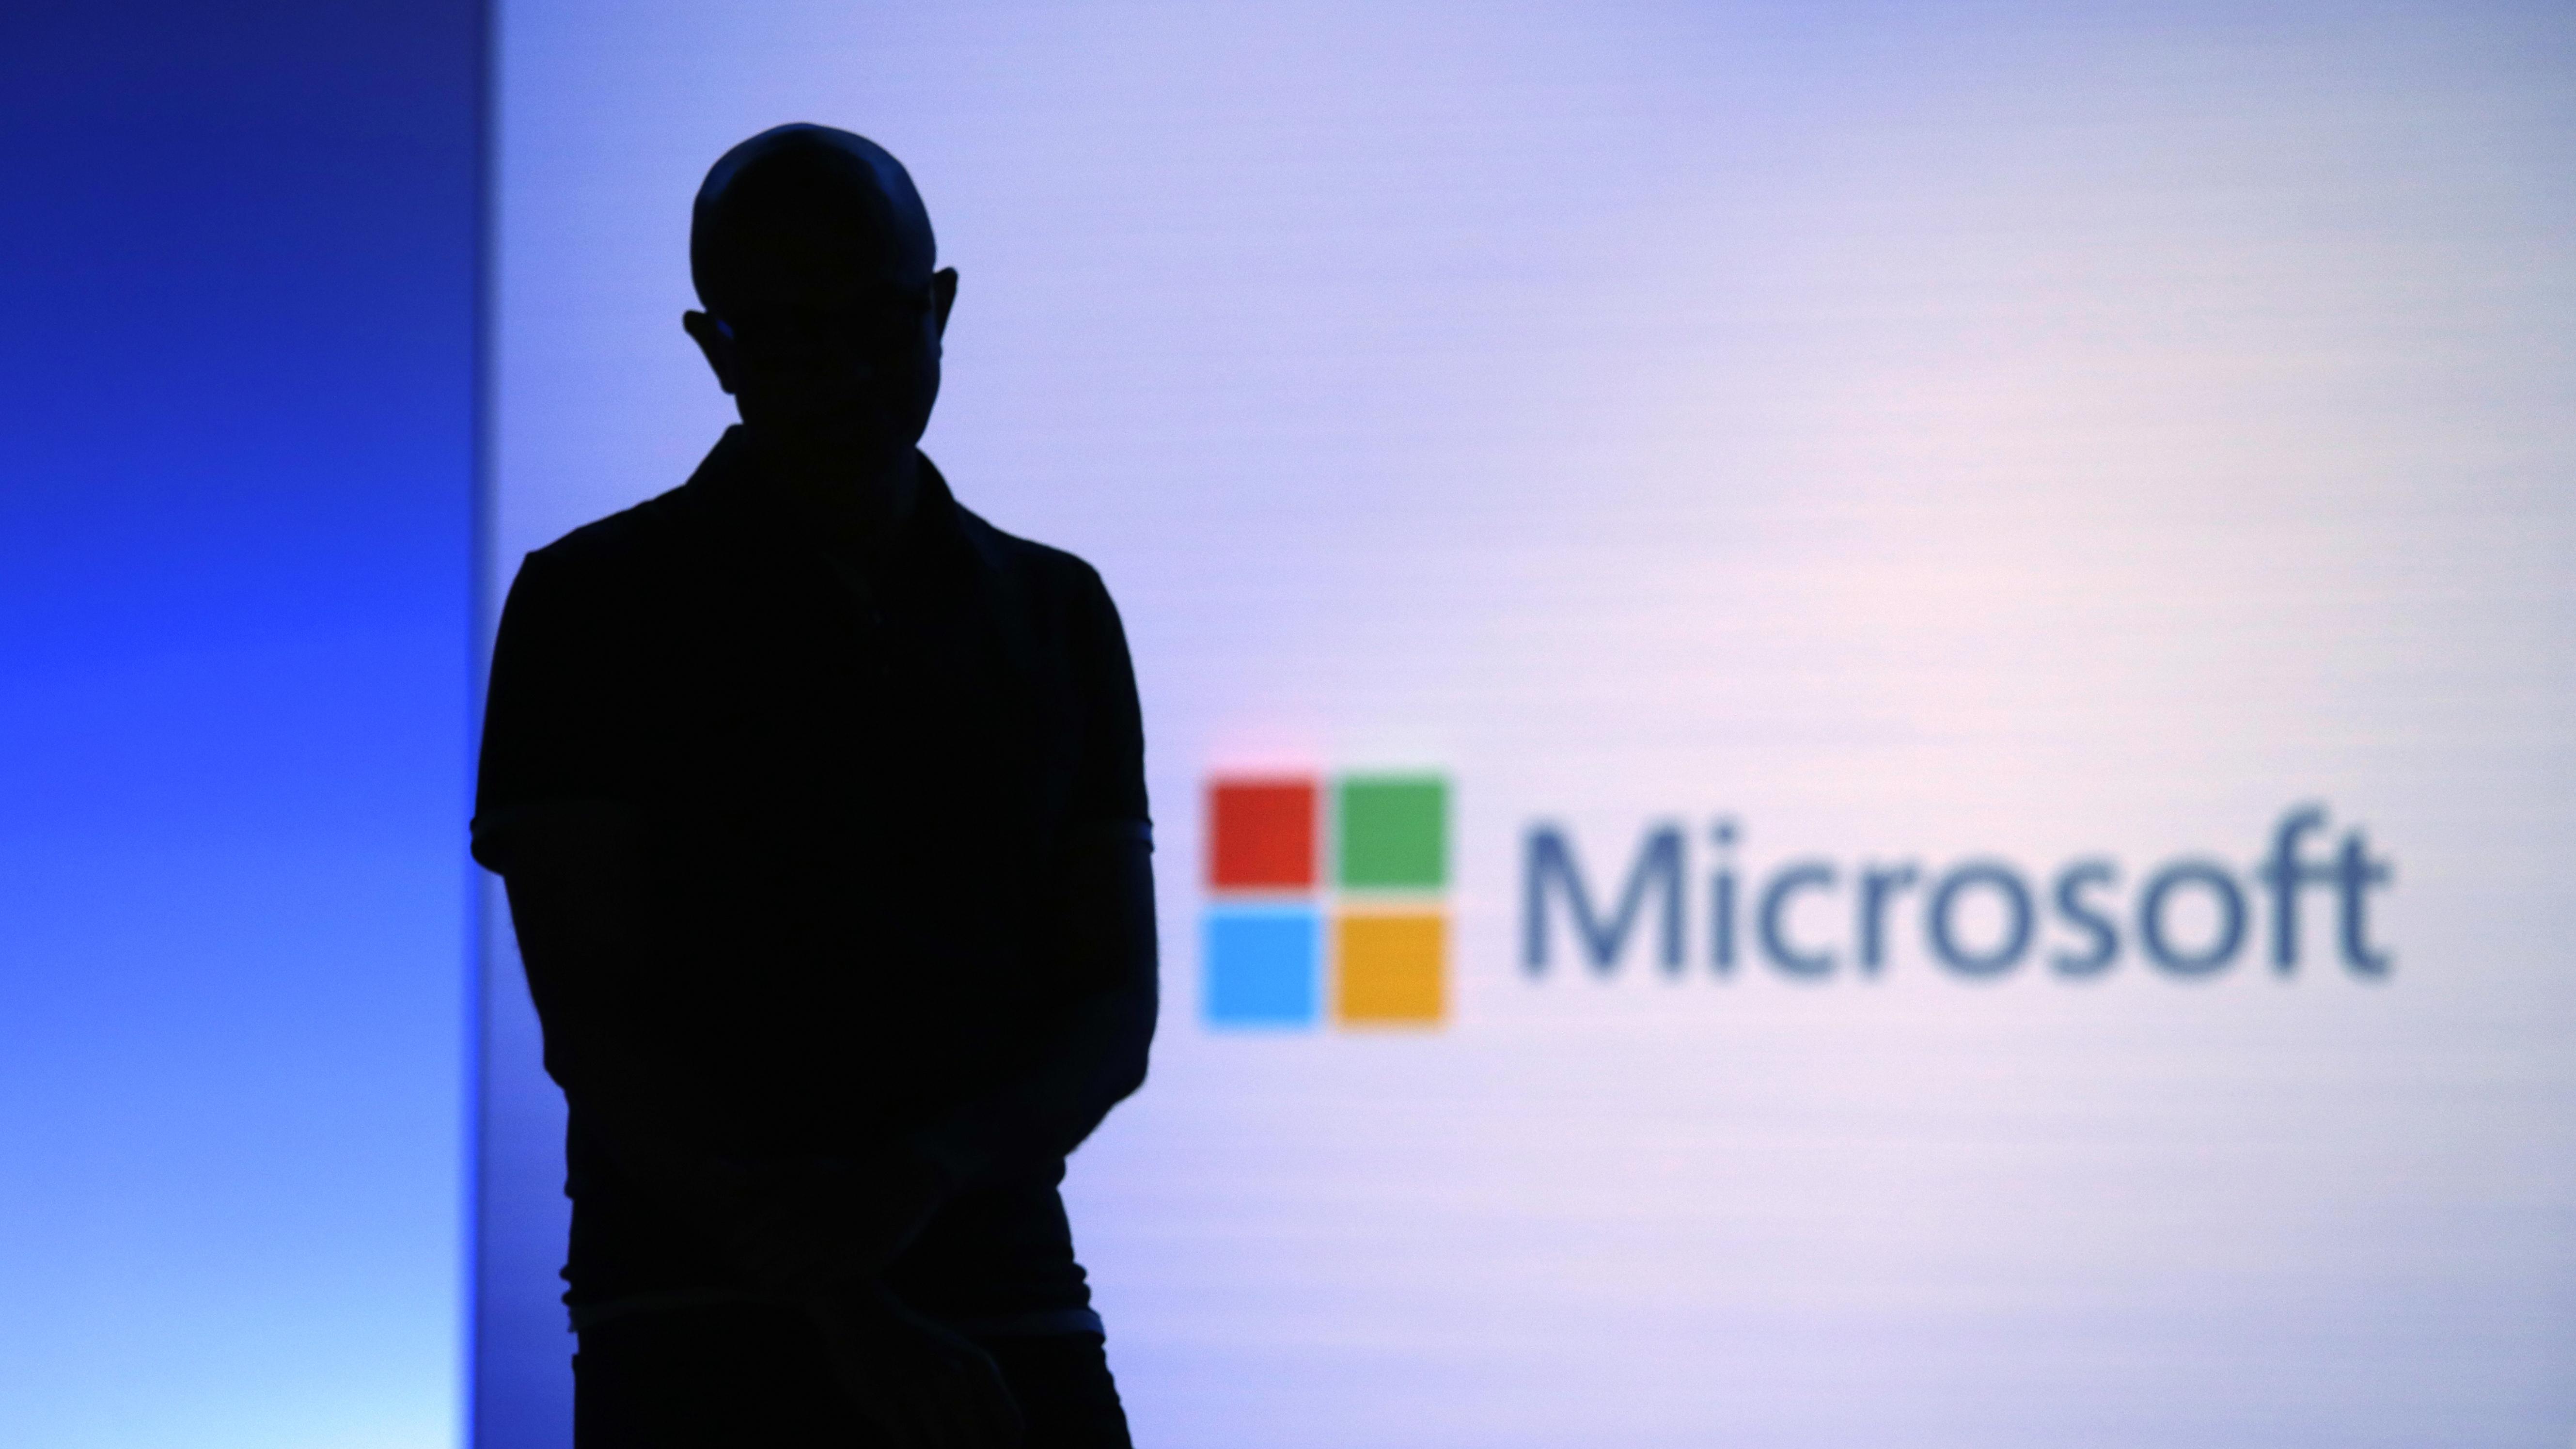 Microsoft has a new identity — Quartz